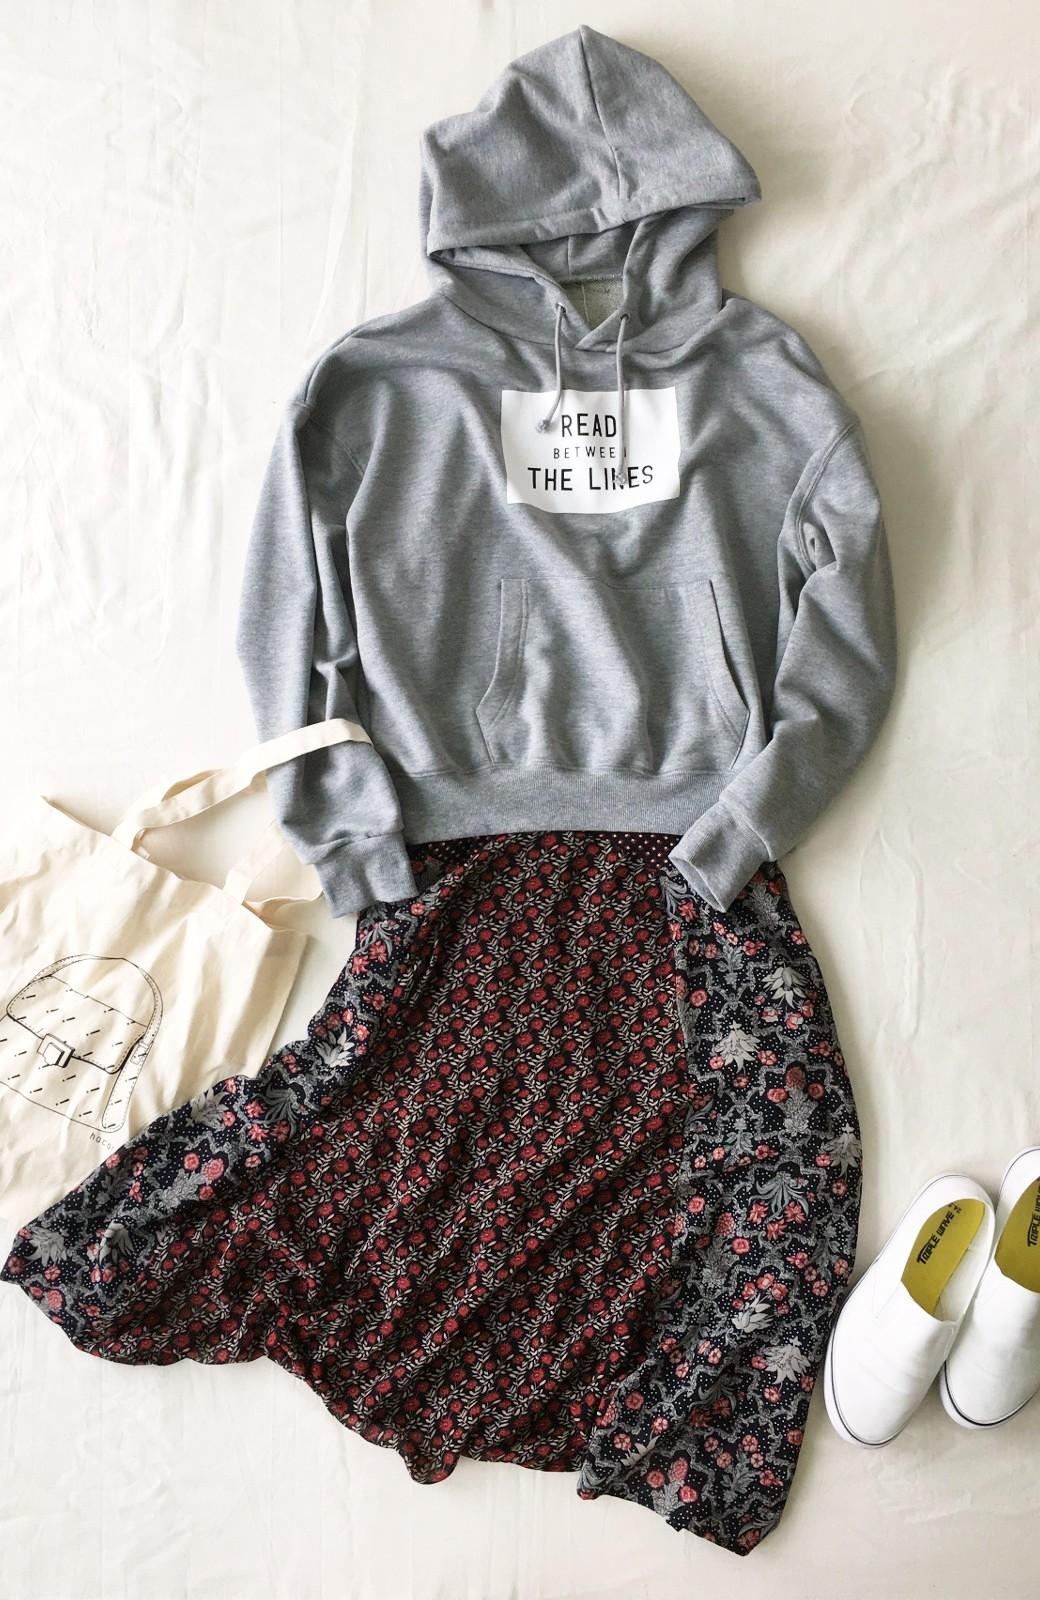 haco! 【洗濯機洗いOK】シンプルなトップスに合わせるだけでかわいくなれる MIX柄スカート <ブラック系その他>の商品写真19